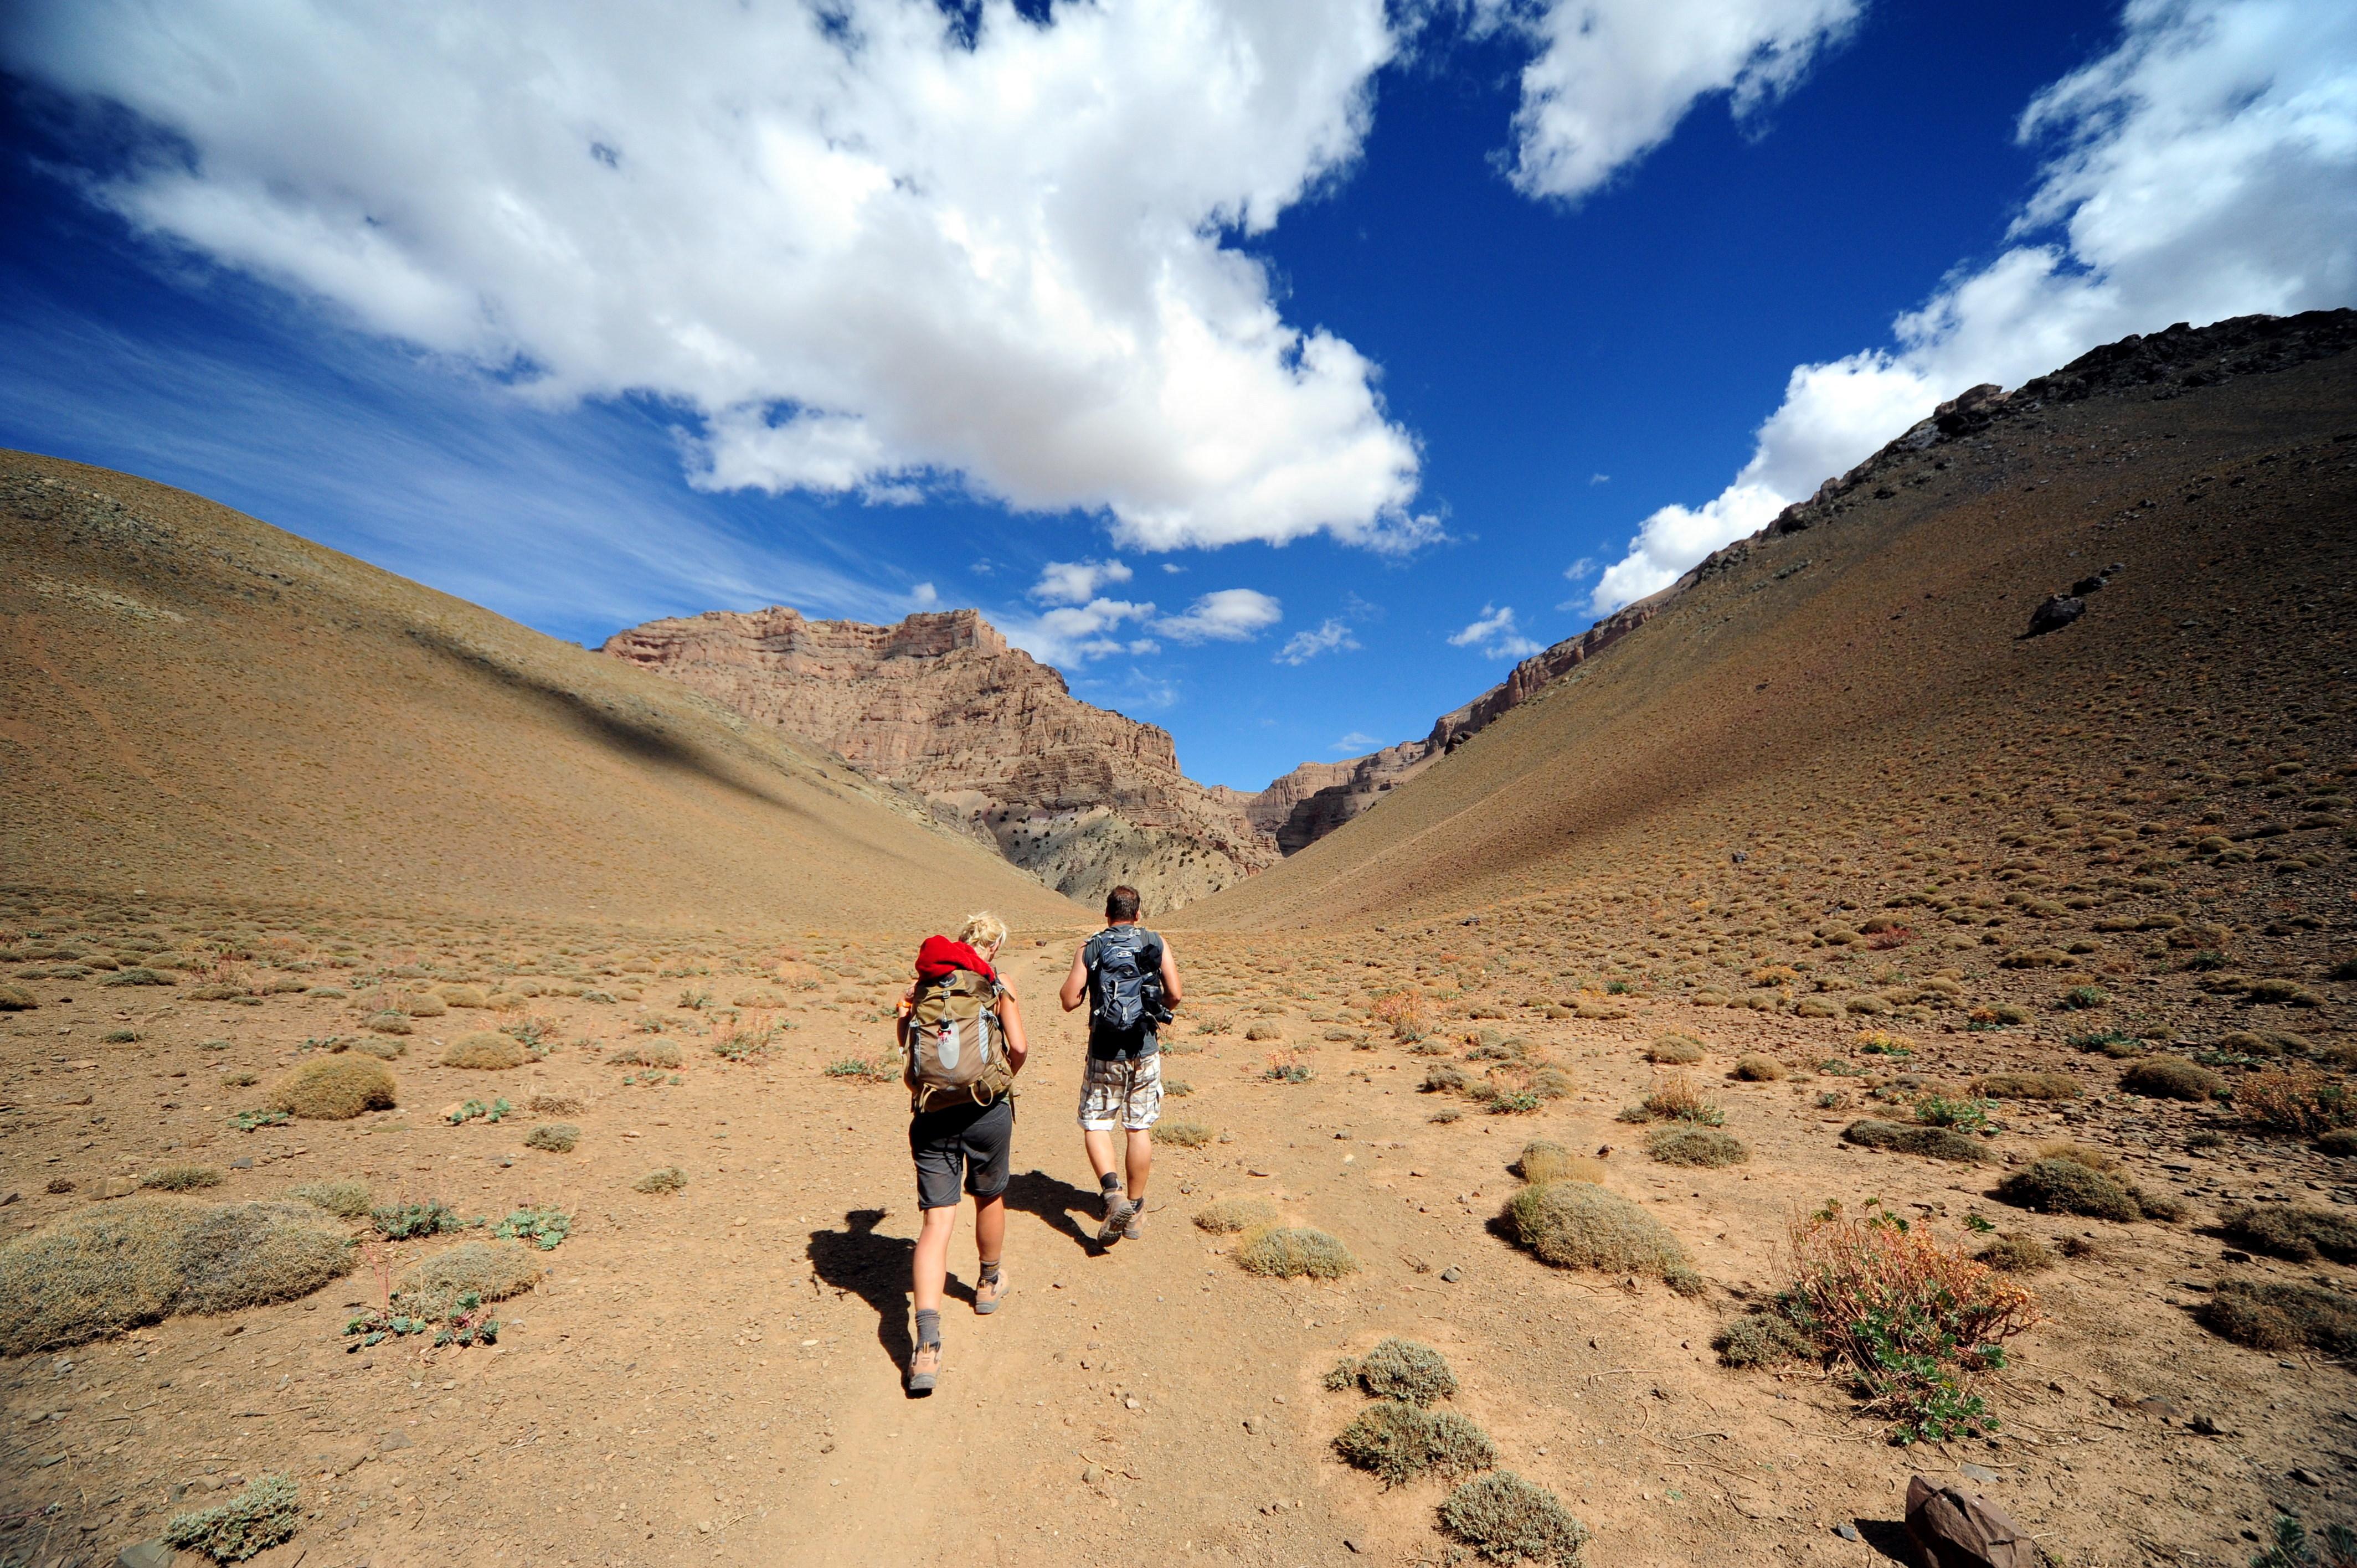 morocco adventure tours and adventure travel morocco